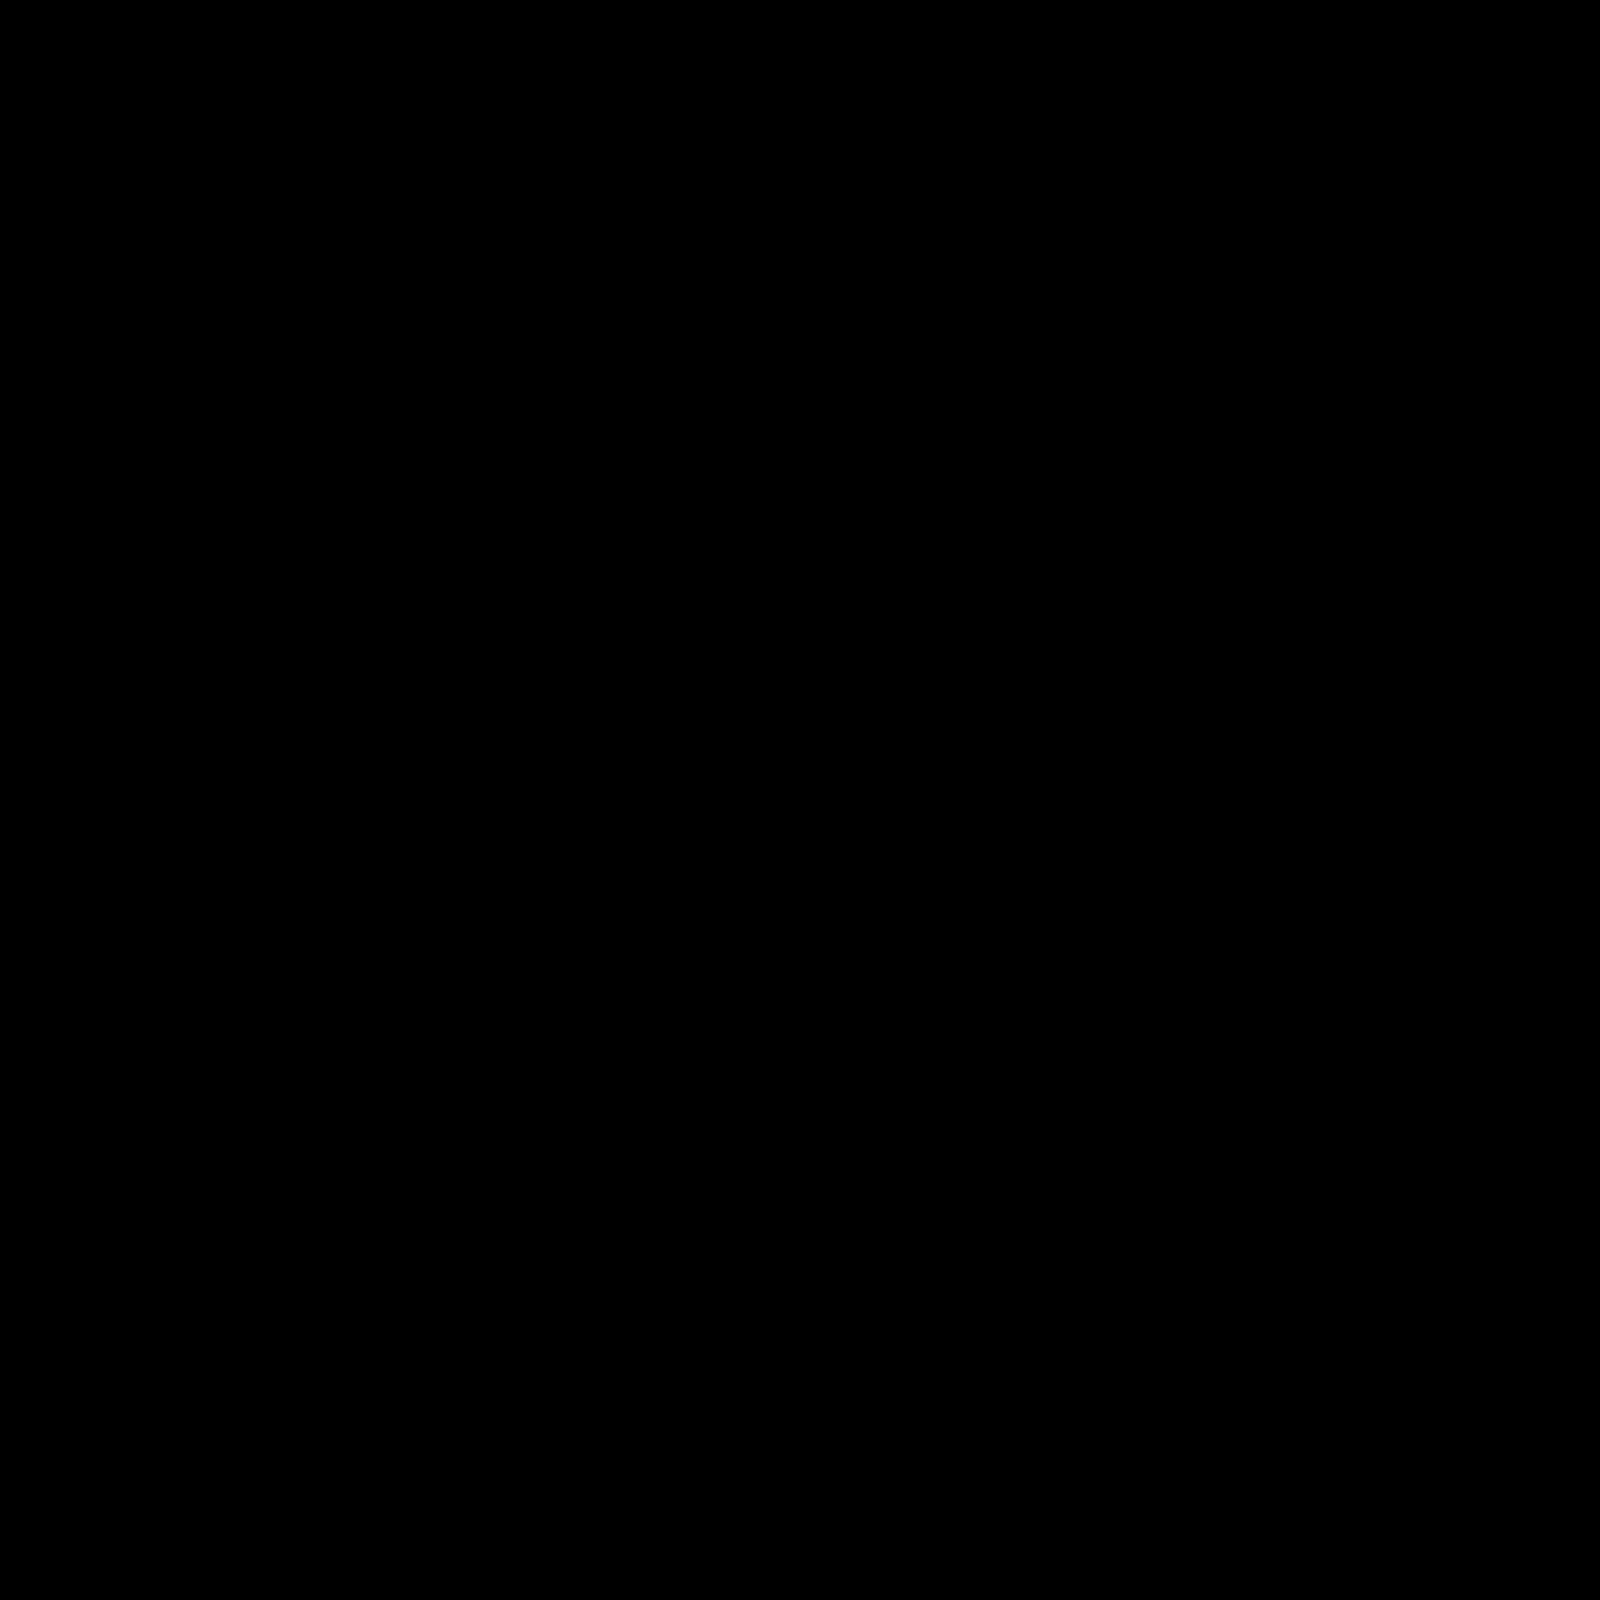 logo rencontre net echangistes